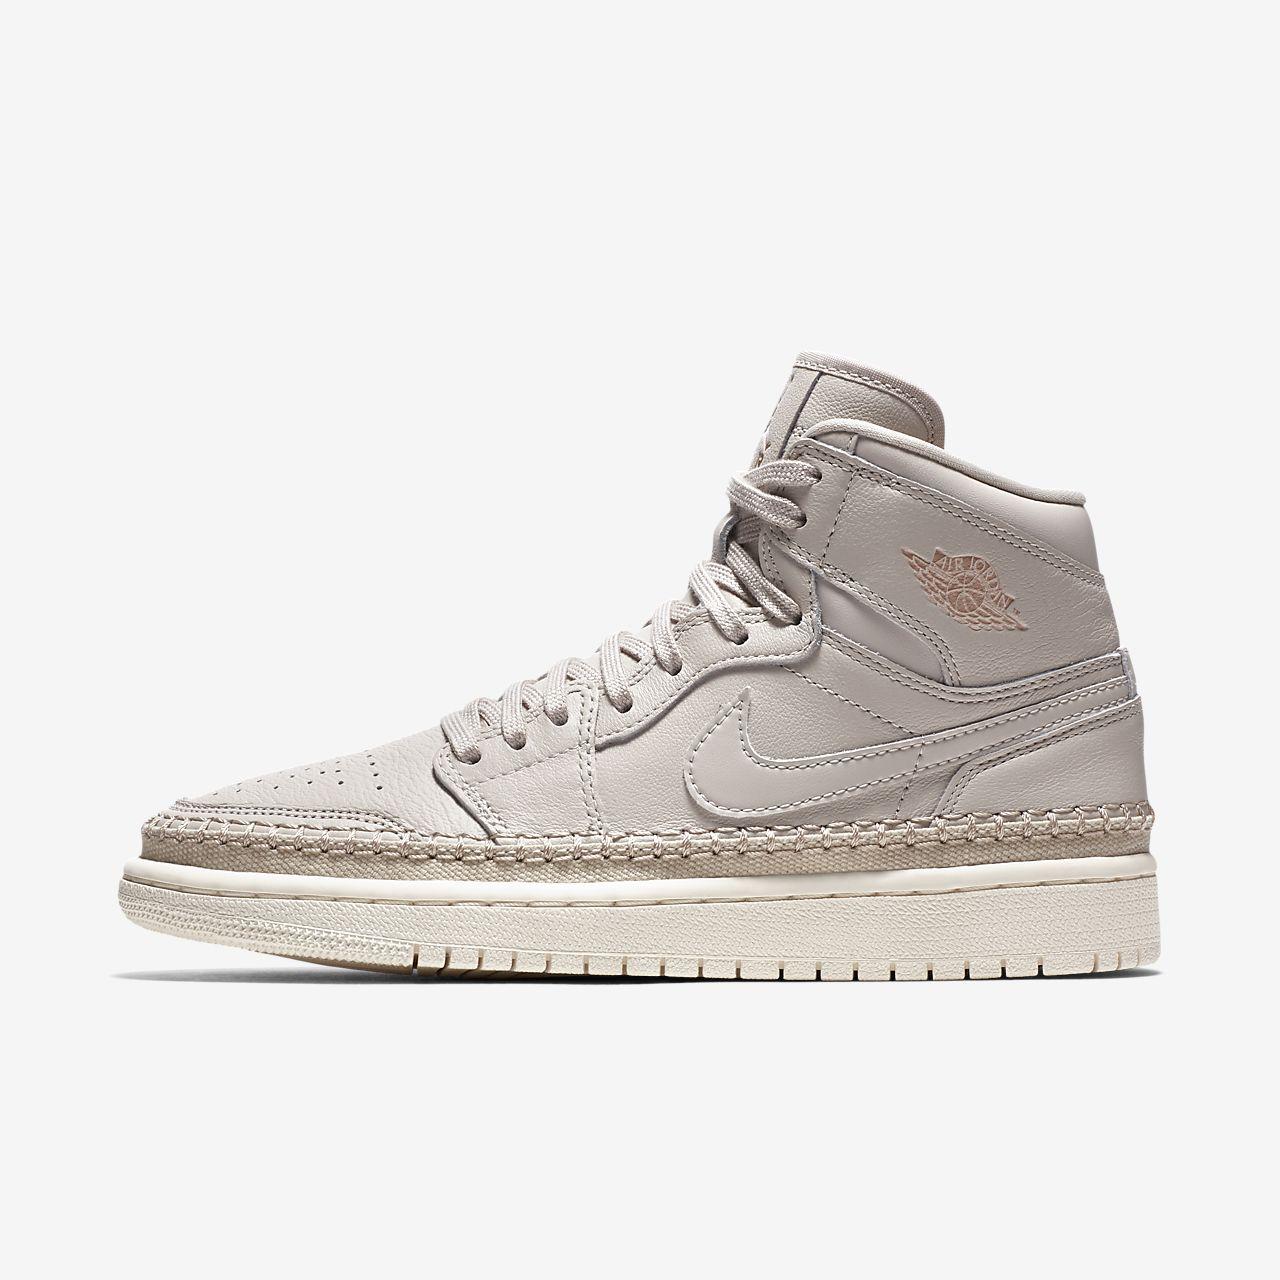 more photos 2deb6 c875b Sko Nike Air Jordan 1 Retro High Premium för kvinnor